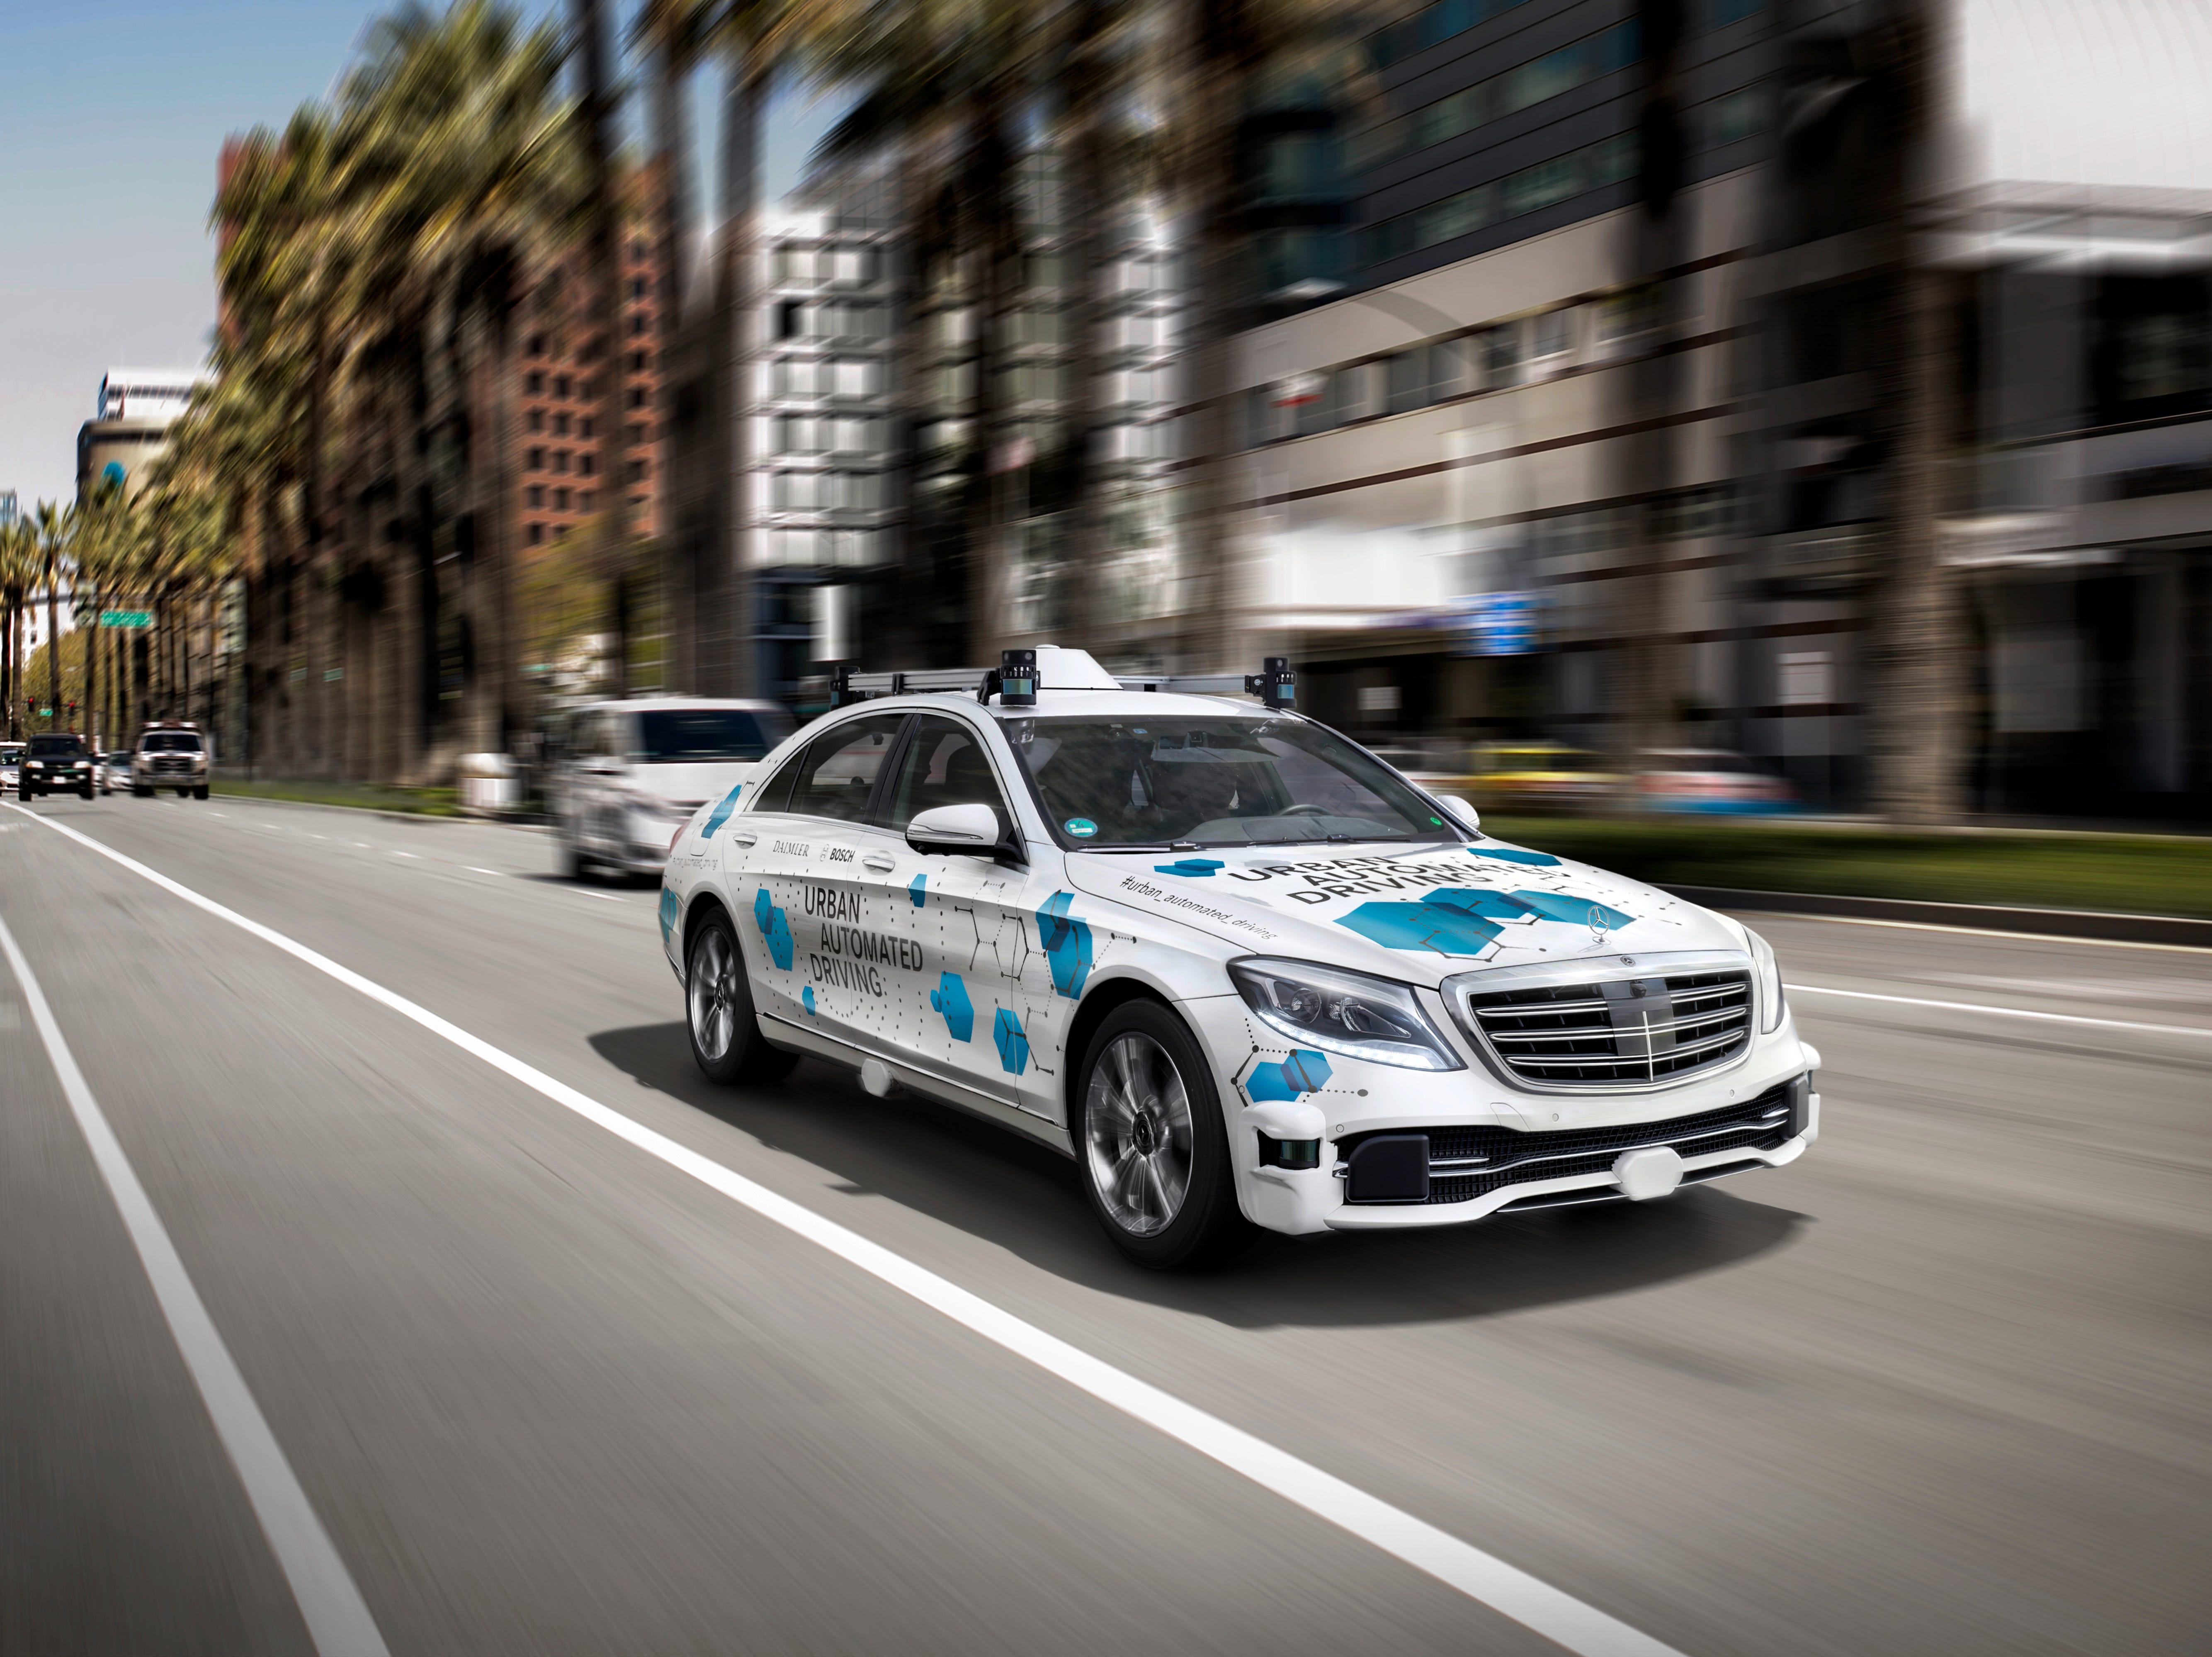 Mercedes-Benz, Bosch to offer self-driving car rides in San Jose, California